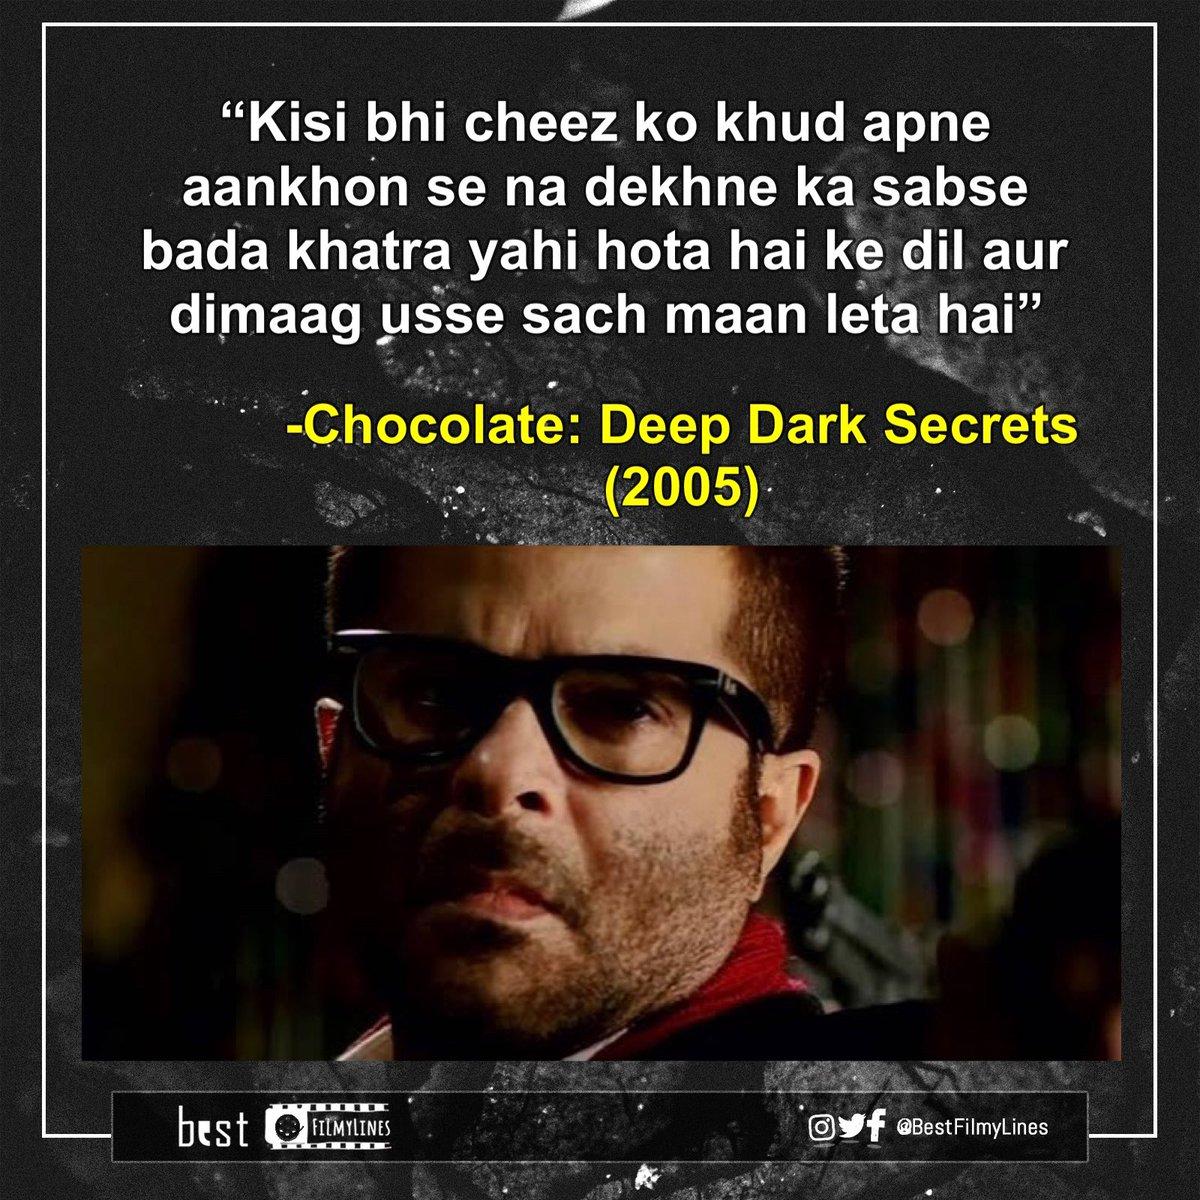 -Chocolate: Deep Dark Secrets (2005), dir. Vivek Agnihotri . . #anilkapoor #bollywood #bollywoodmovie #bollywoodmovies #bollywooddialogue #indiancinema #hindi #hindimovie #dialogue #dialogues #moviequotes #quote #quotes #bestfilmylines